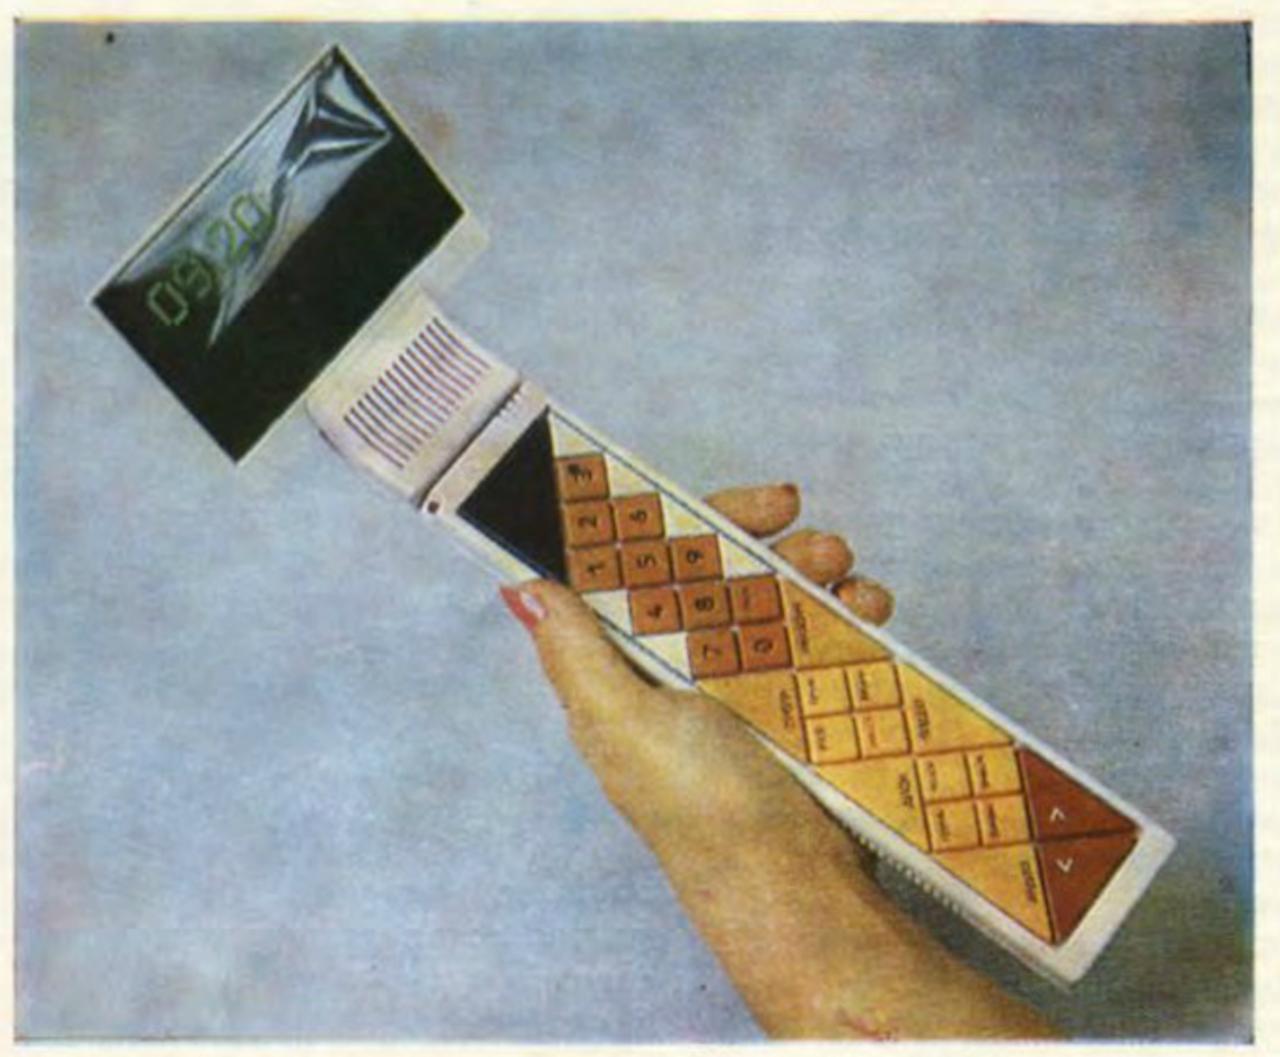 A Sphinx remote control.